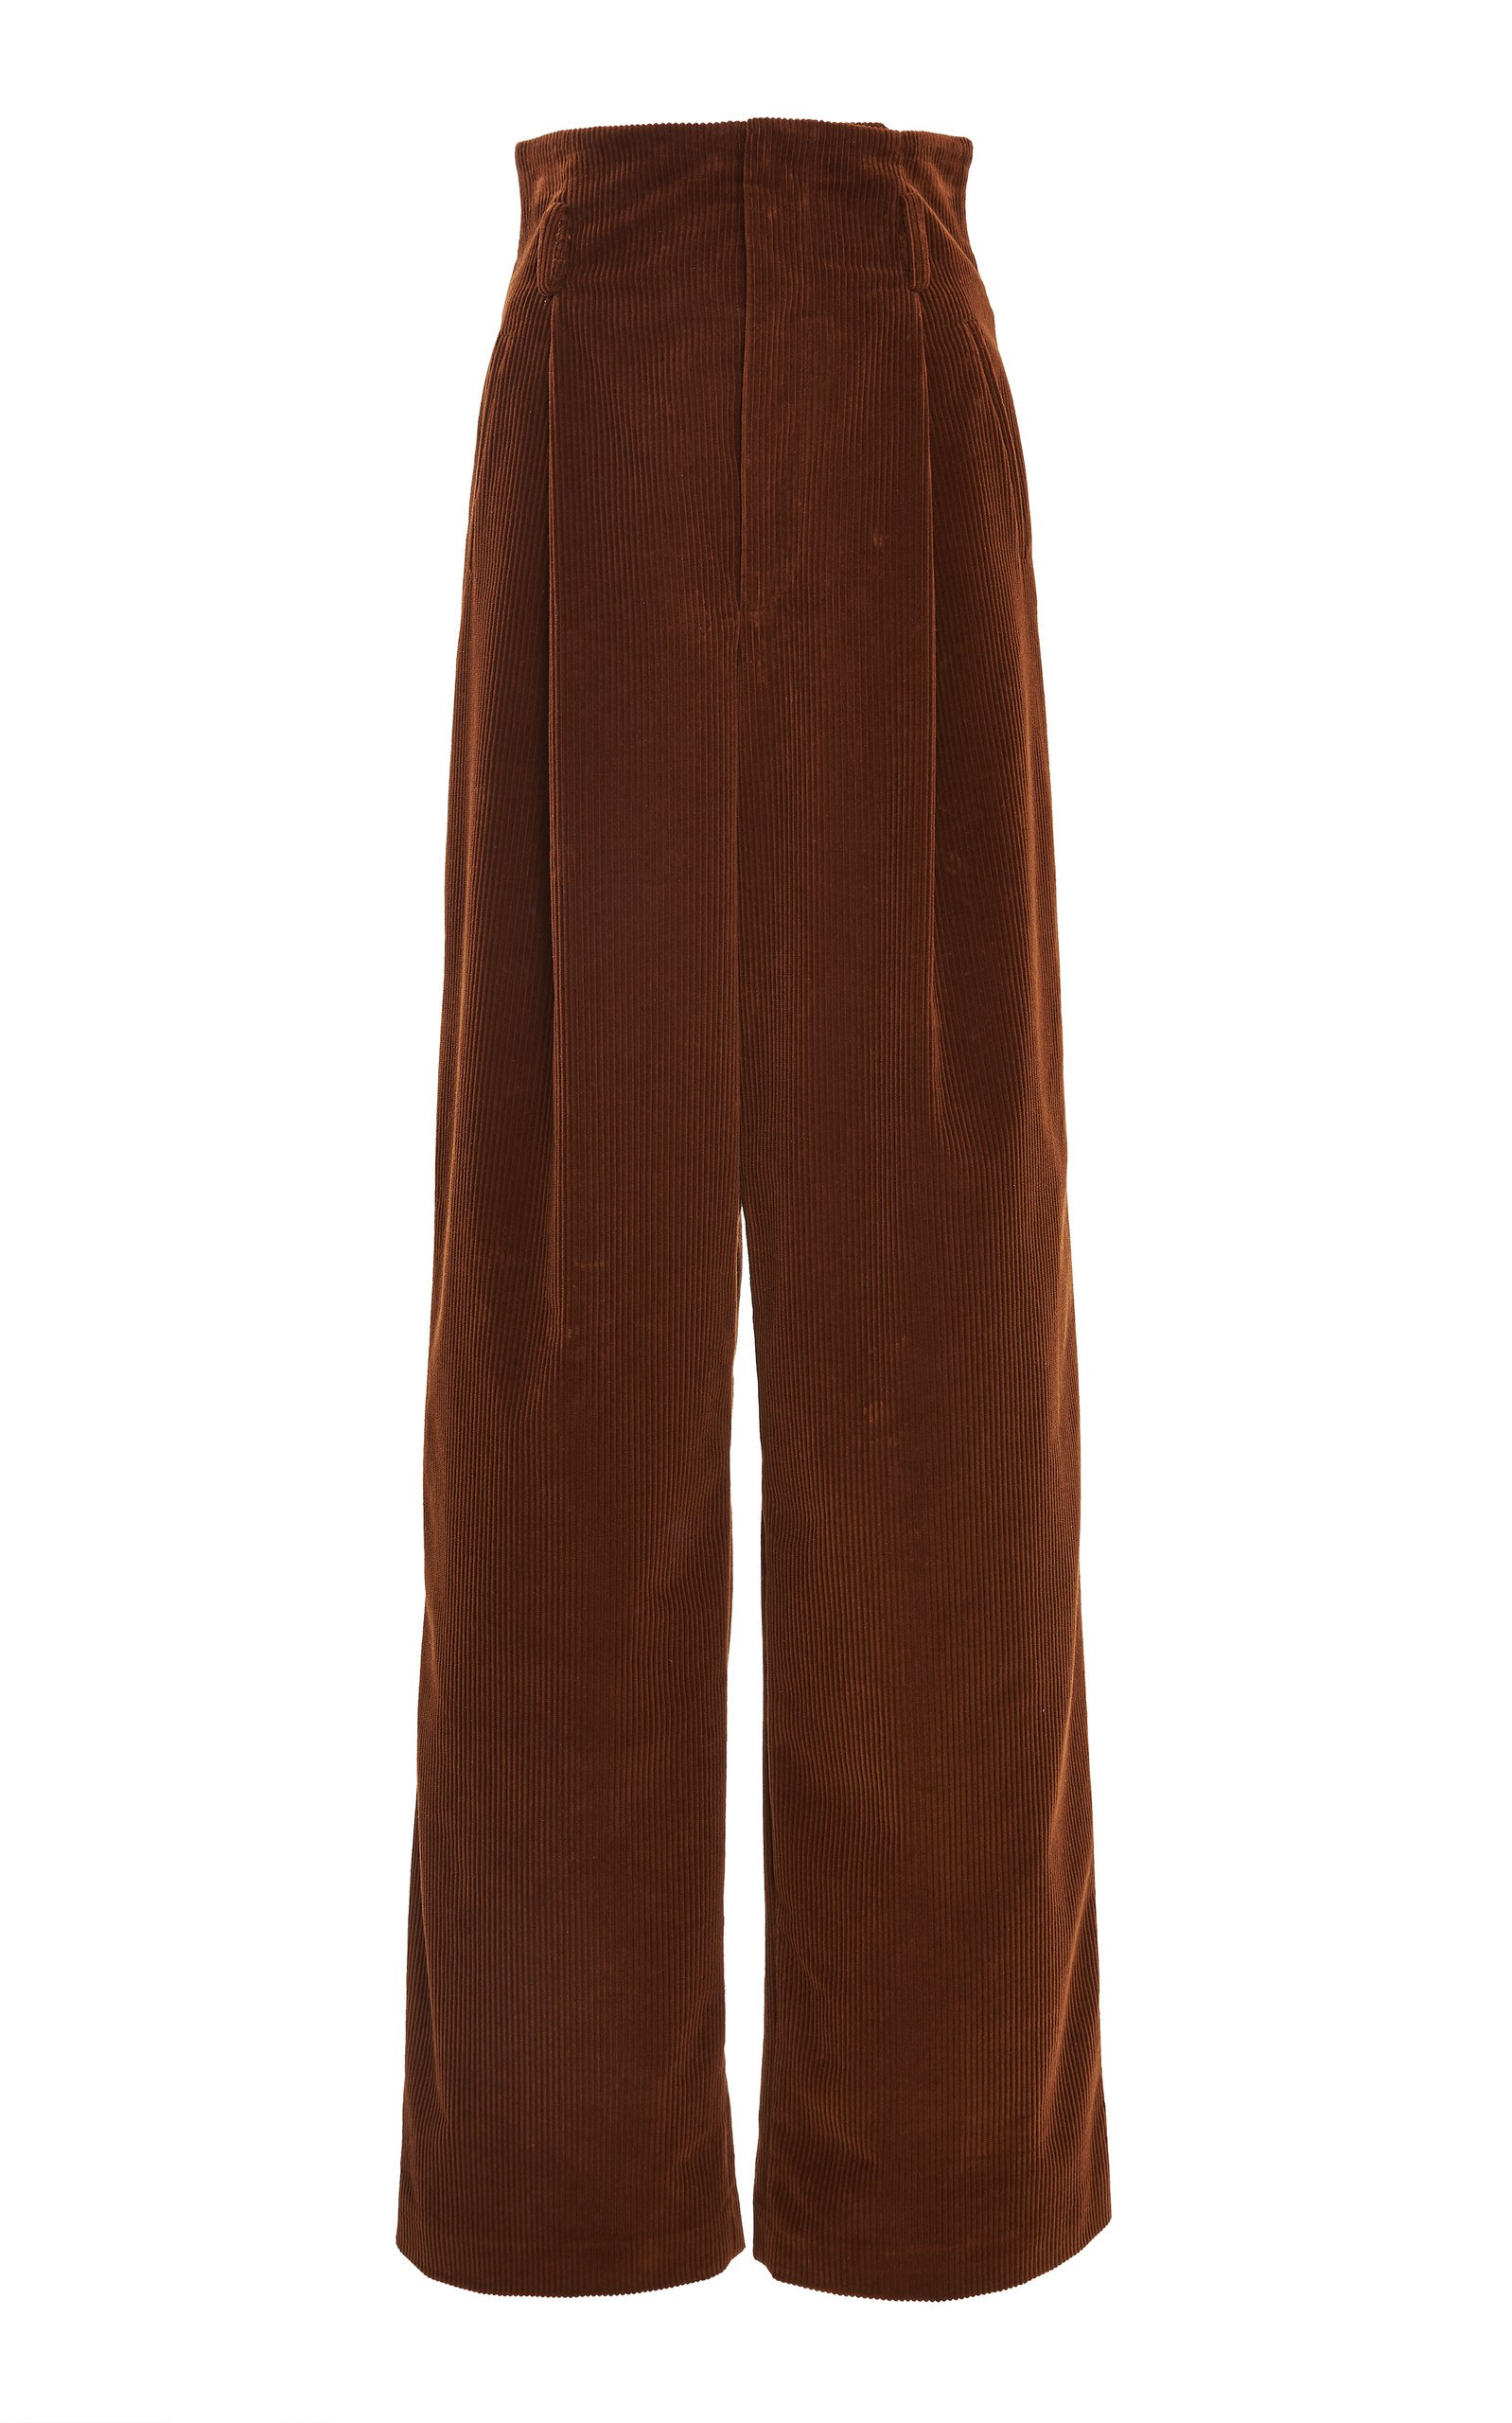 Alberta Ferretti Cotton-Corduroy Wide-Leg Pants